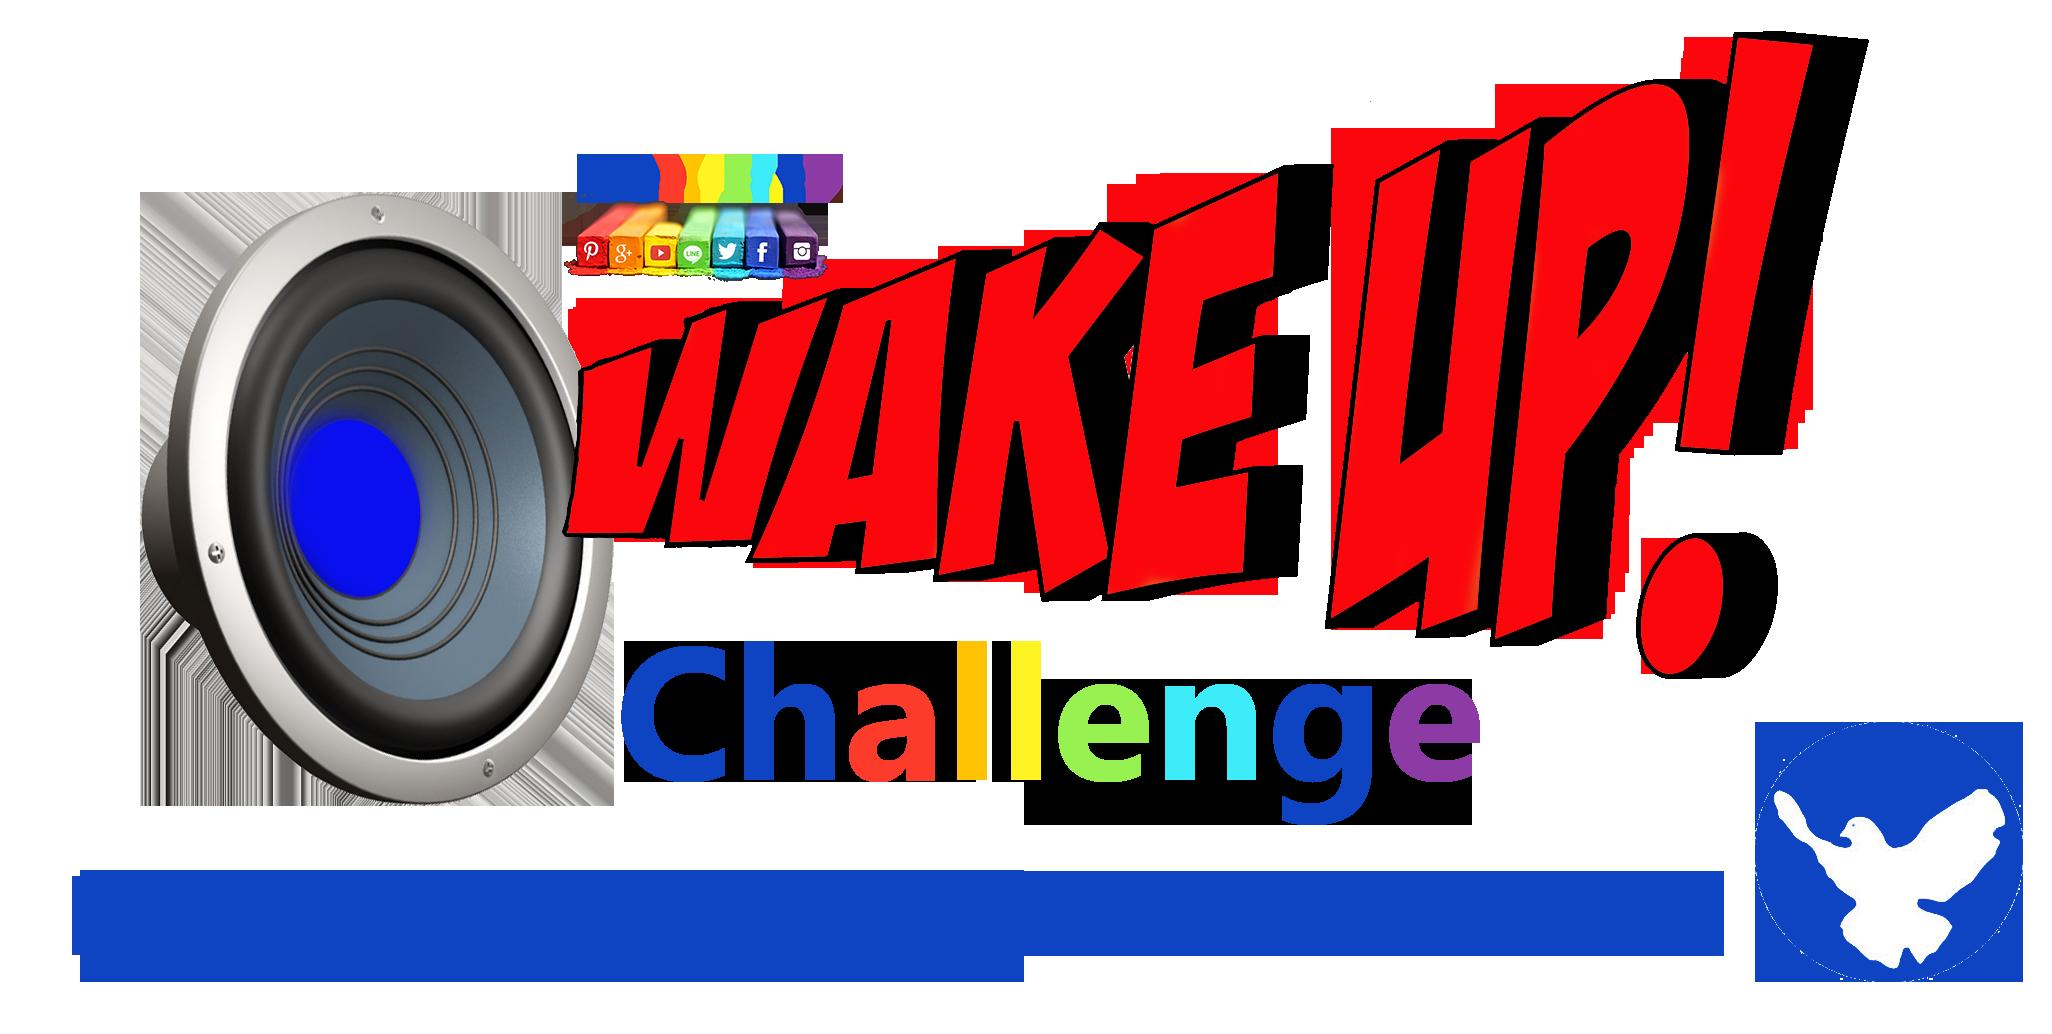 wake up challenge